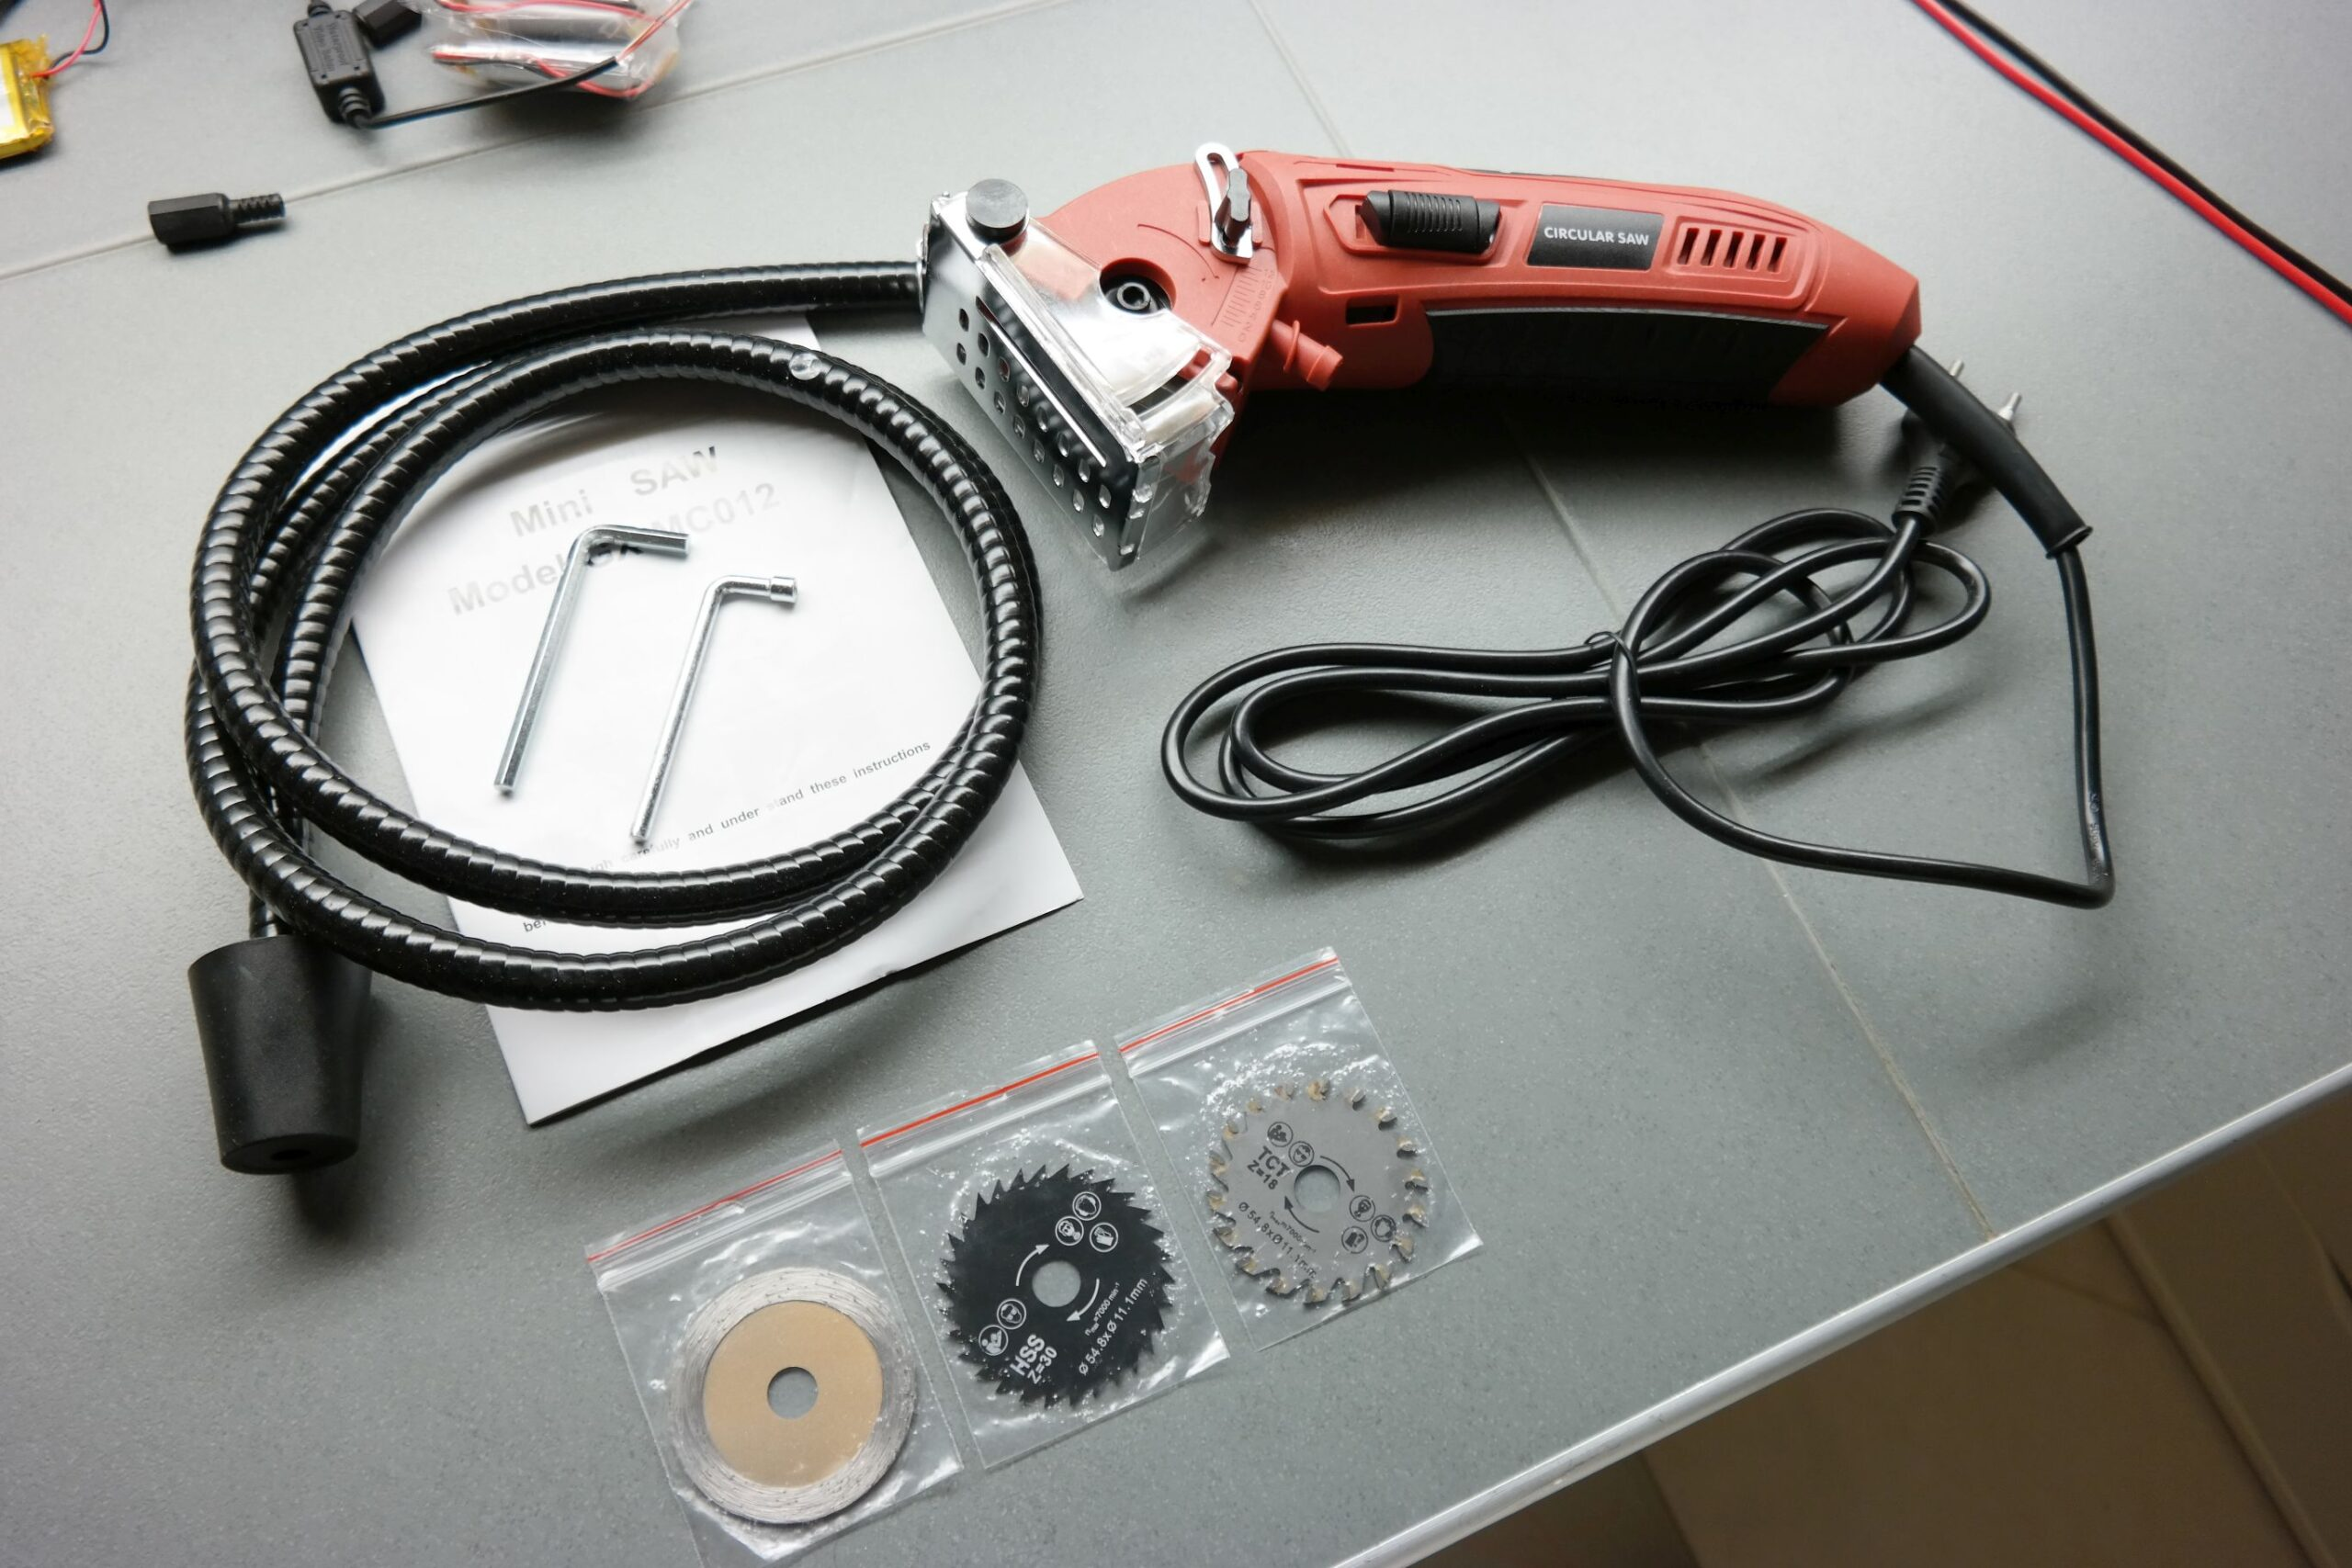 110V/220V Electric Mini Circular Saw For Household Use